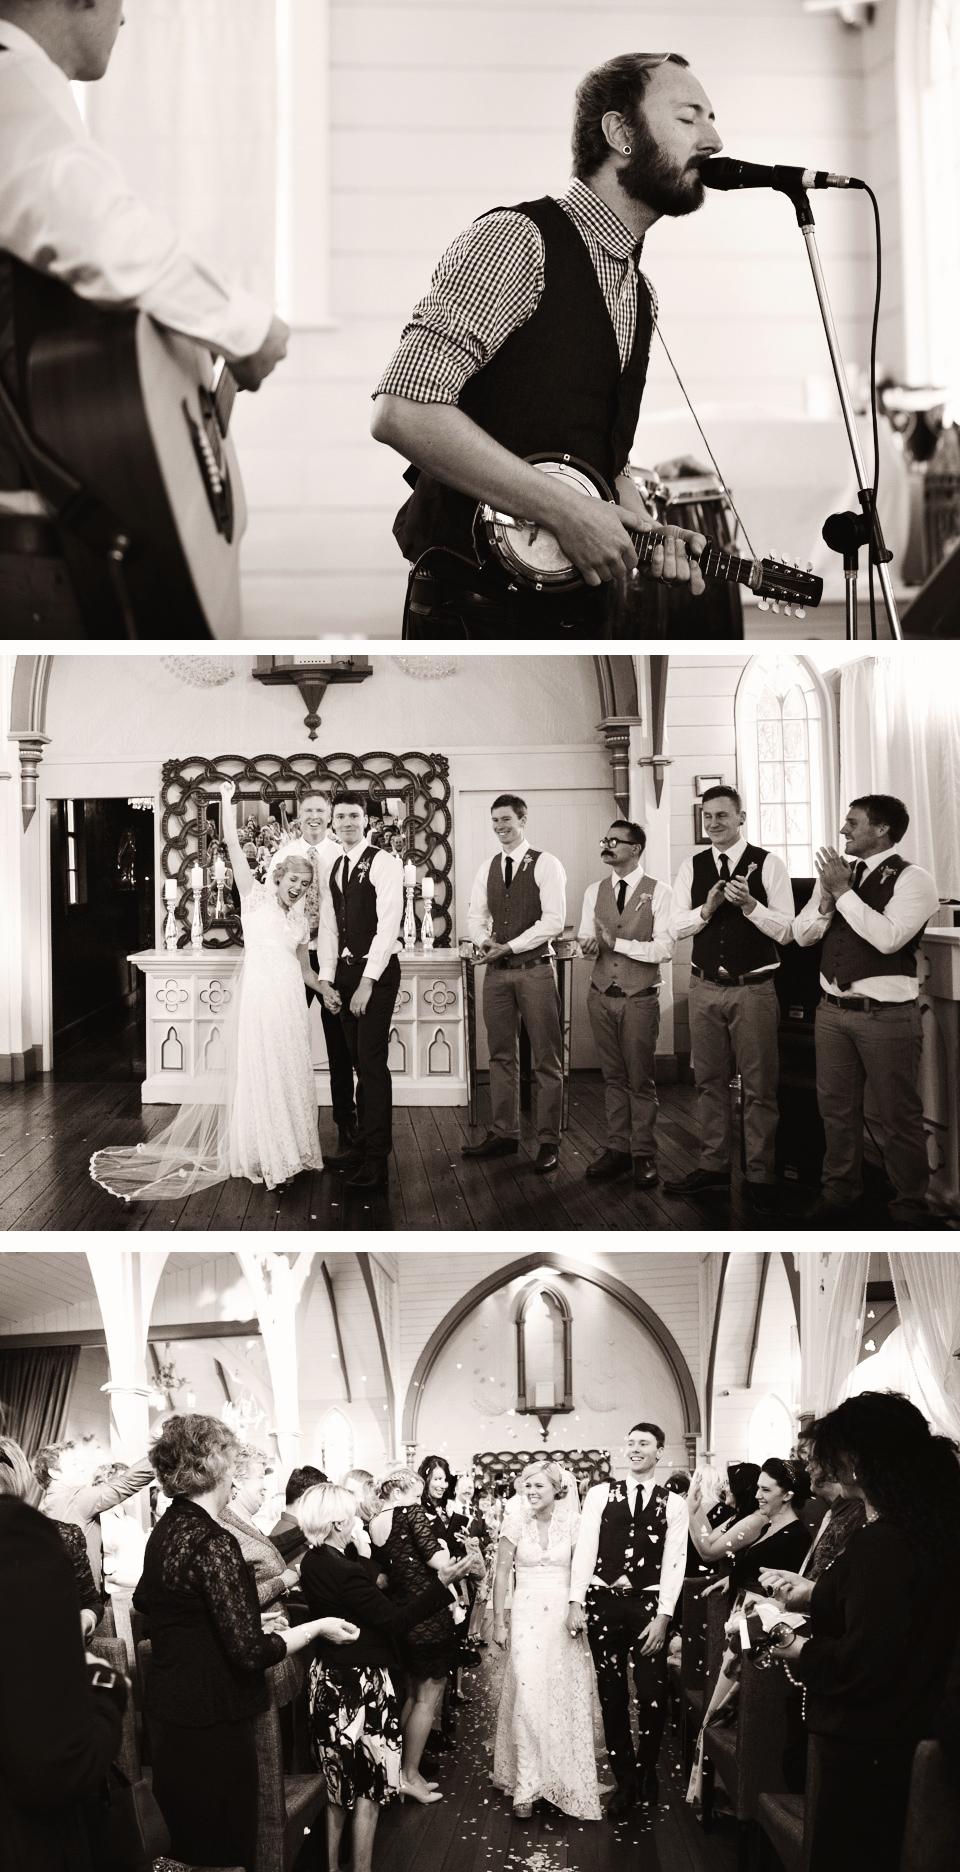 The-Old-Church-wedding-venues-Eva-Bradley (7)